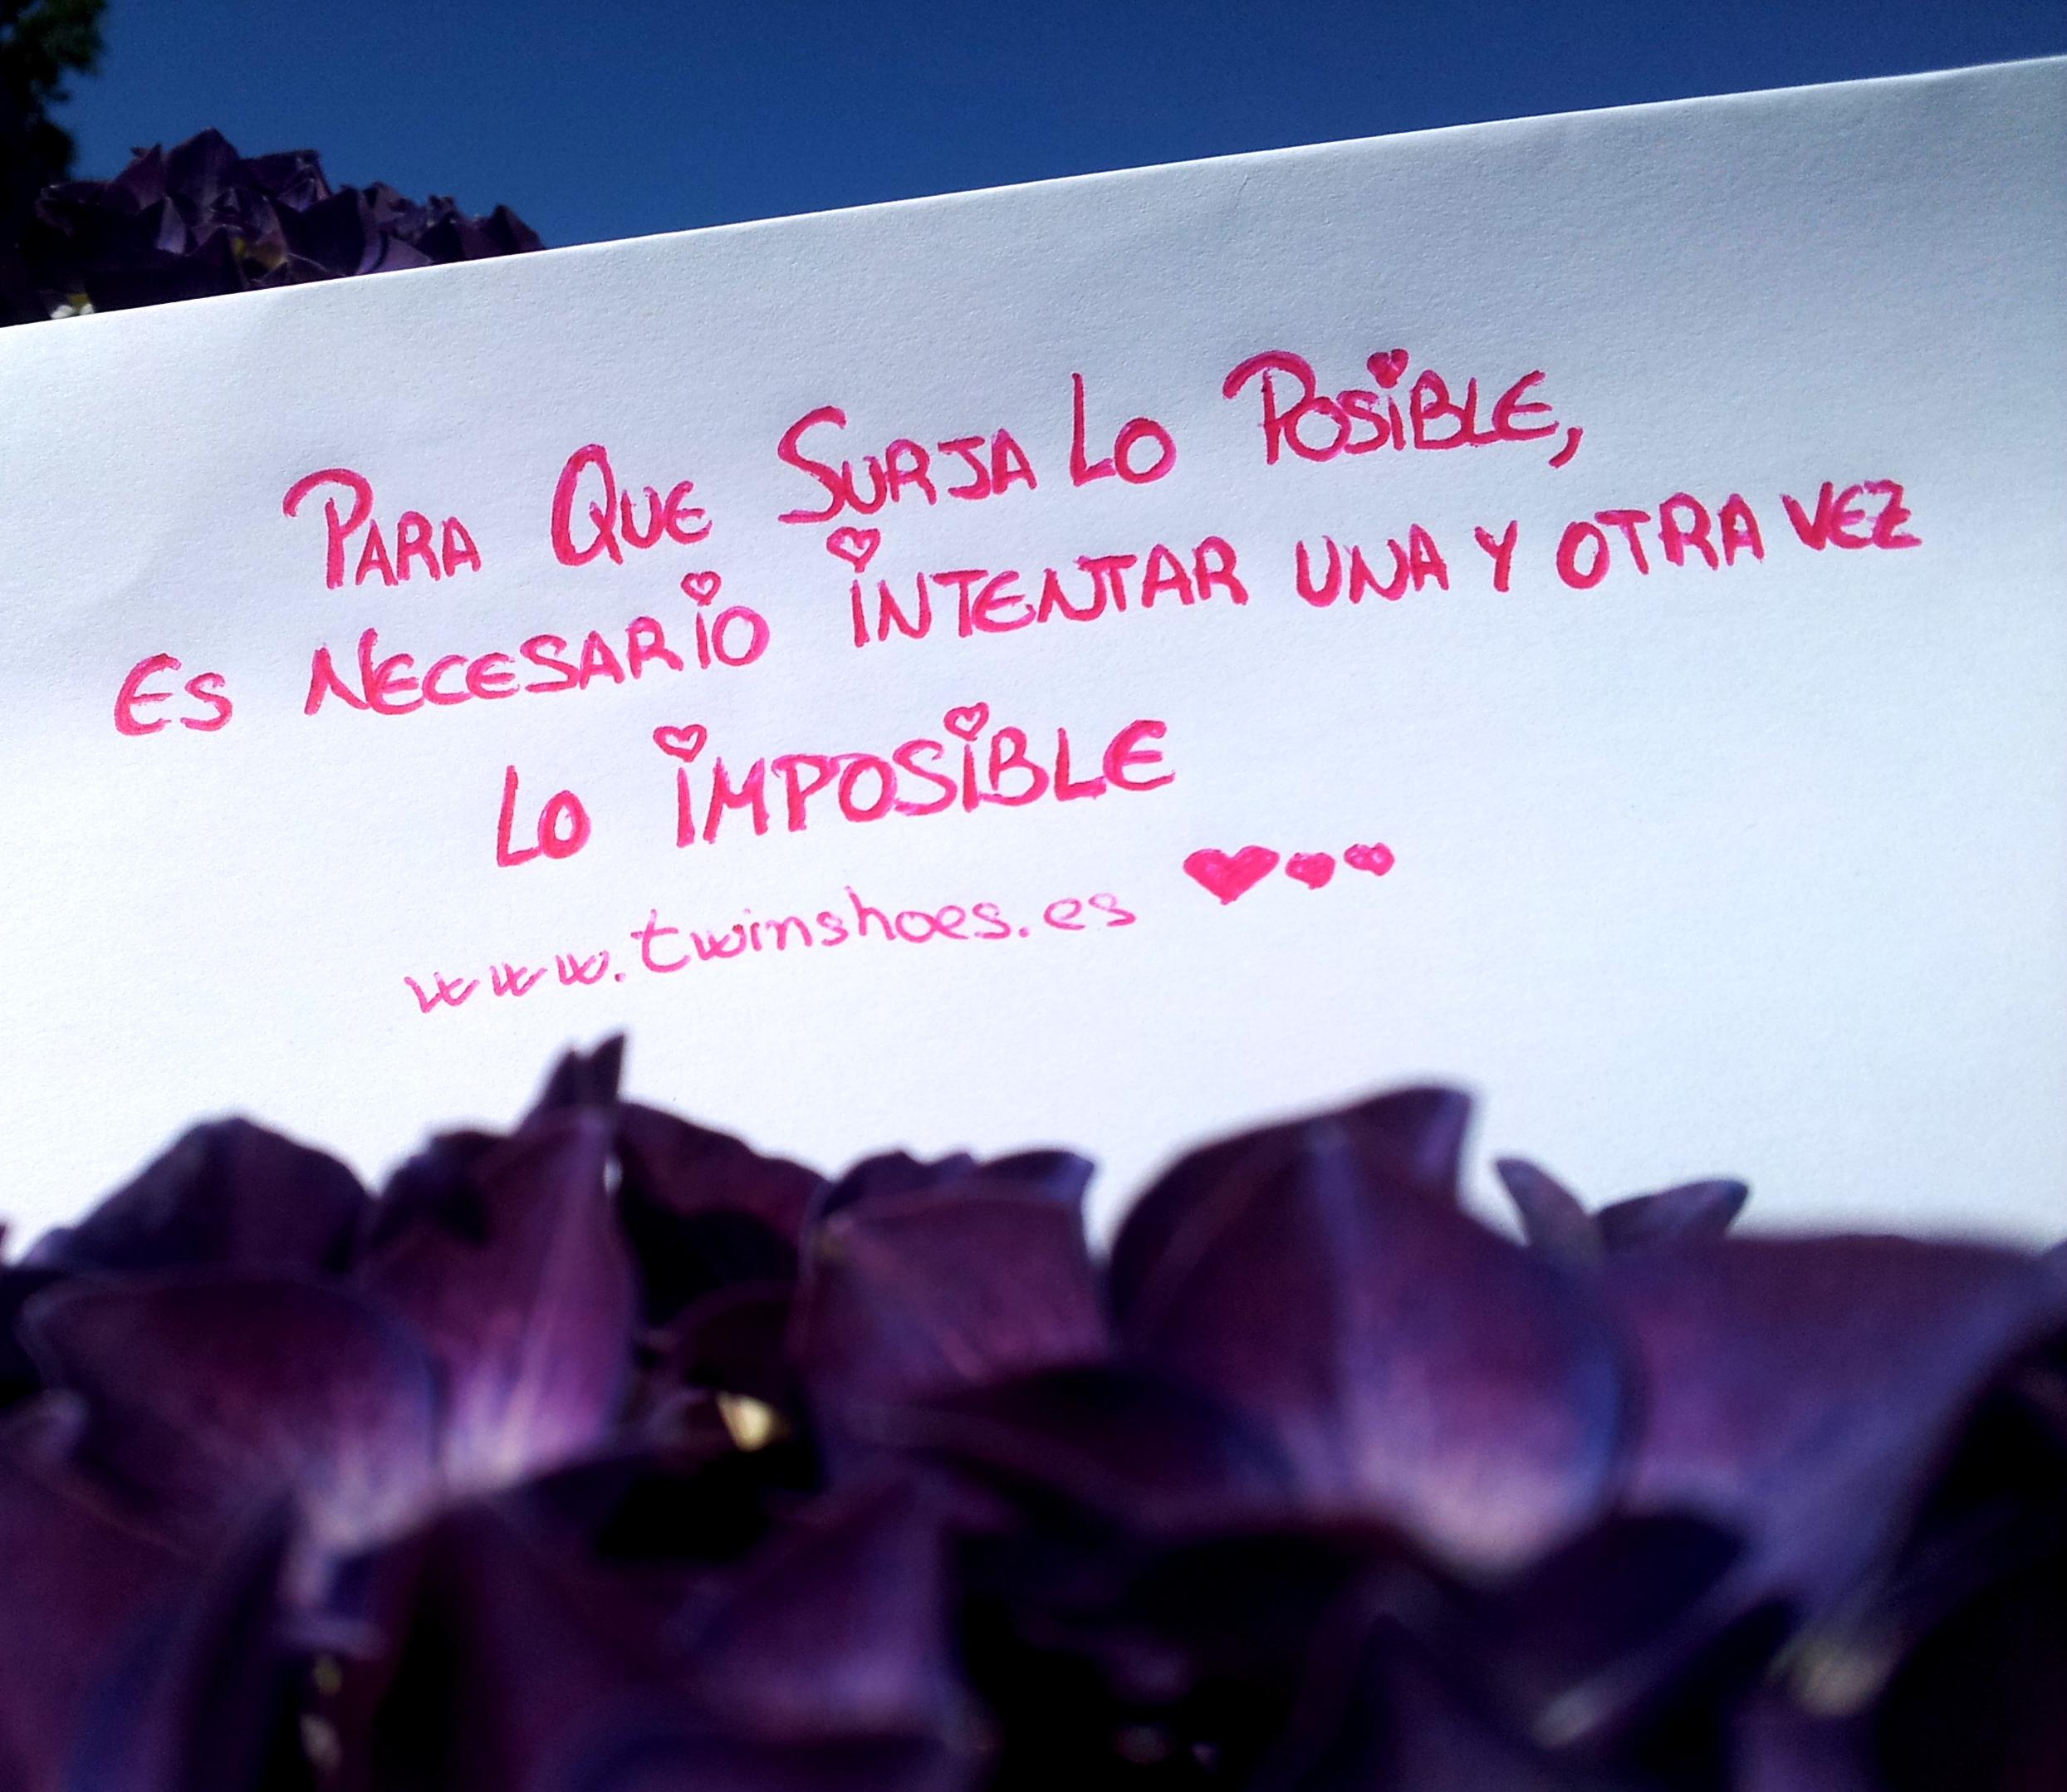 Frases De Amor Imposible Para Whatsapp Imagenes Hermosas